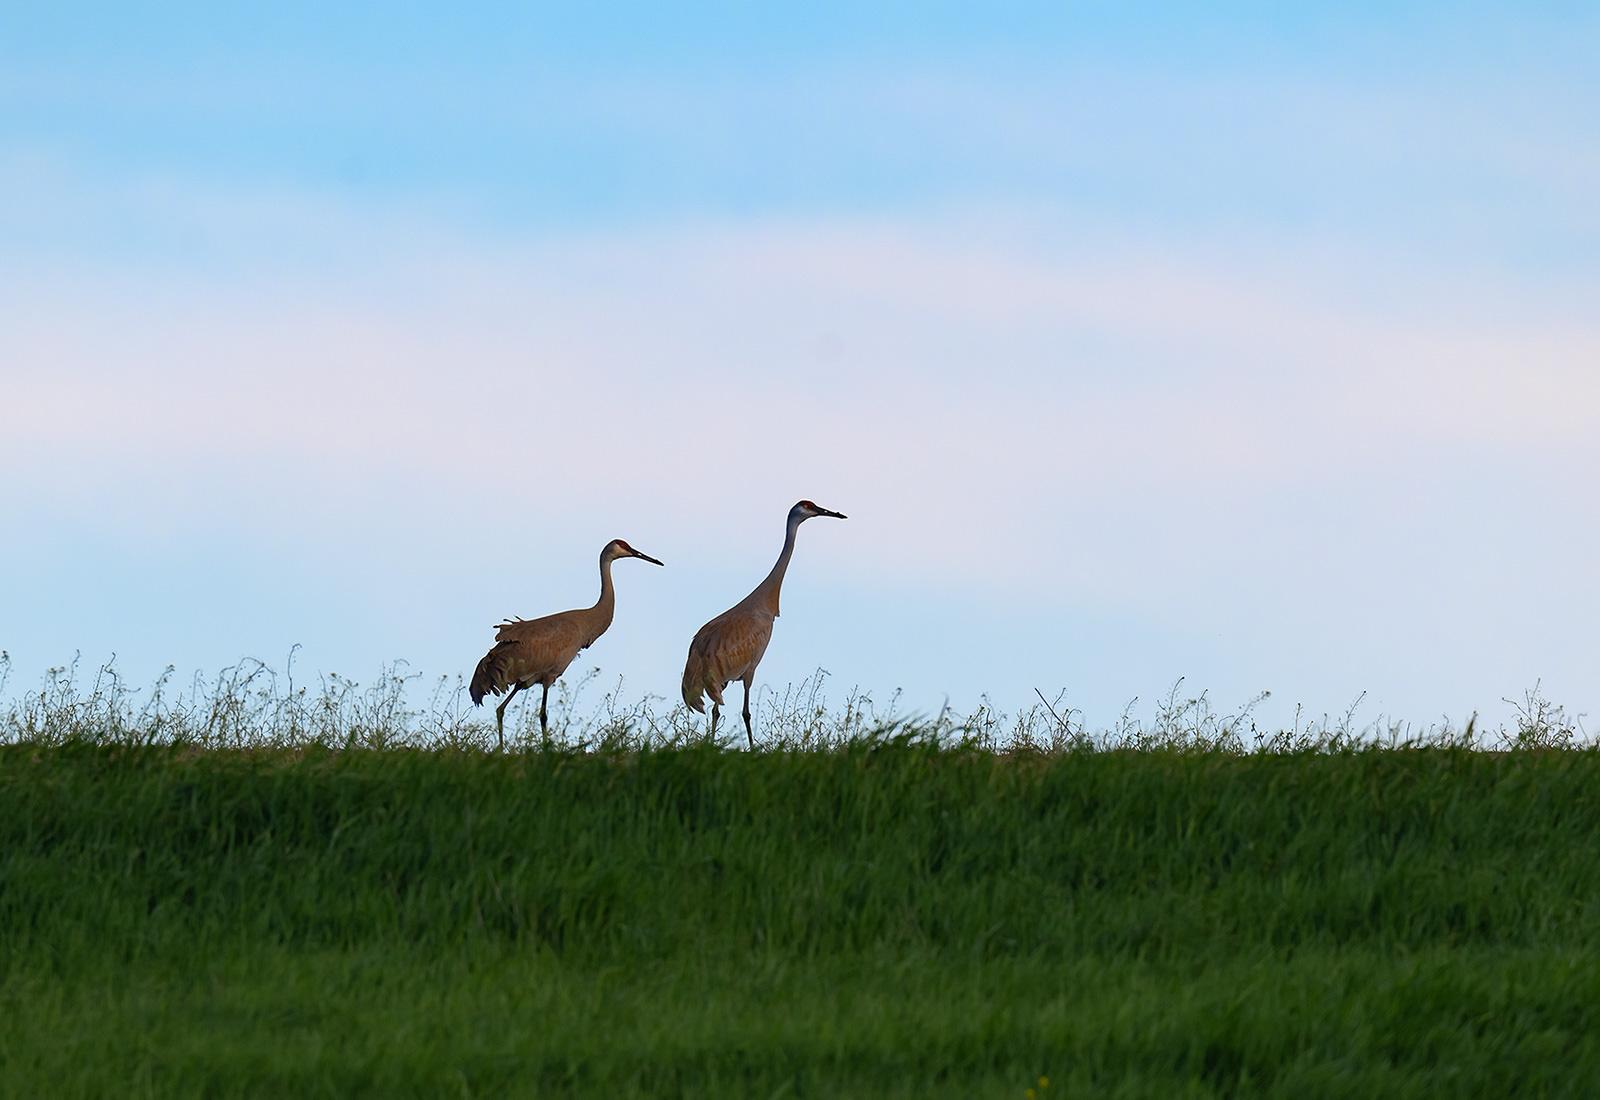 Sandhill Cranes on a hill